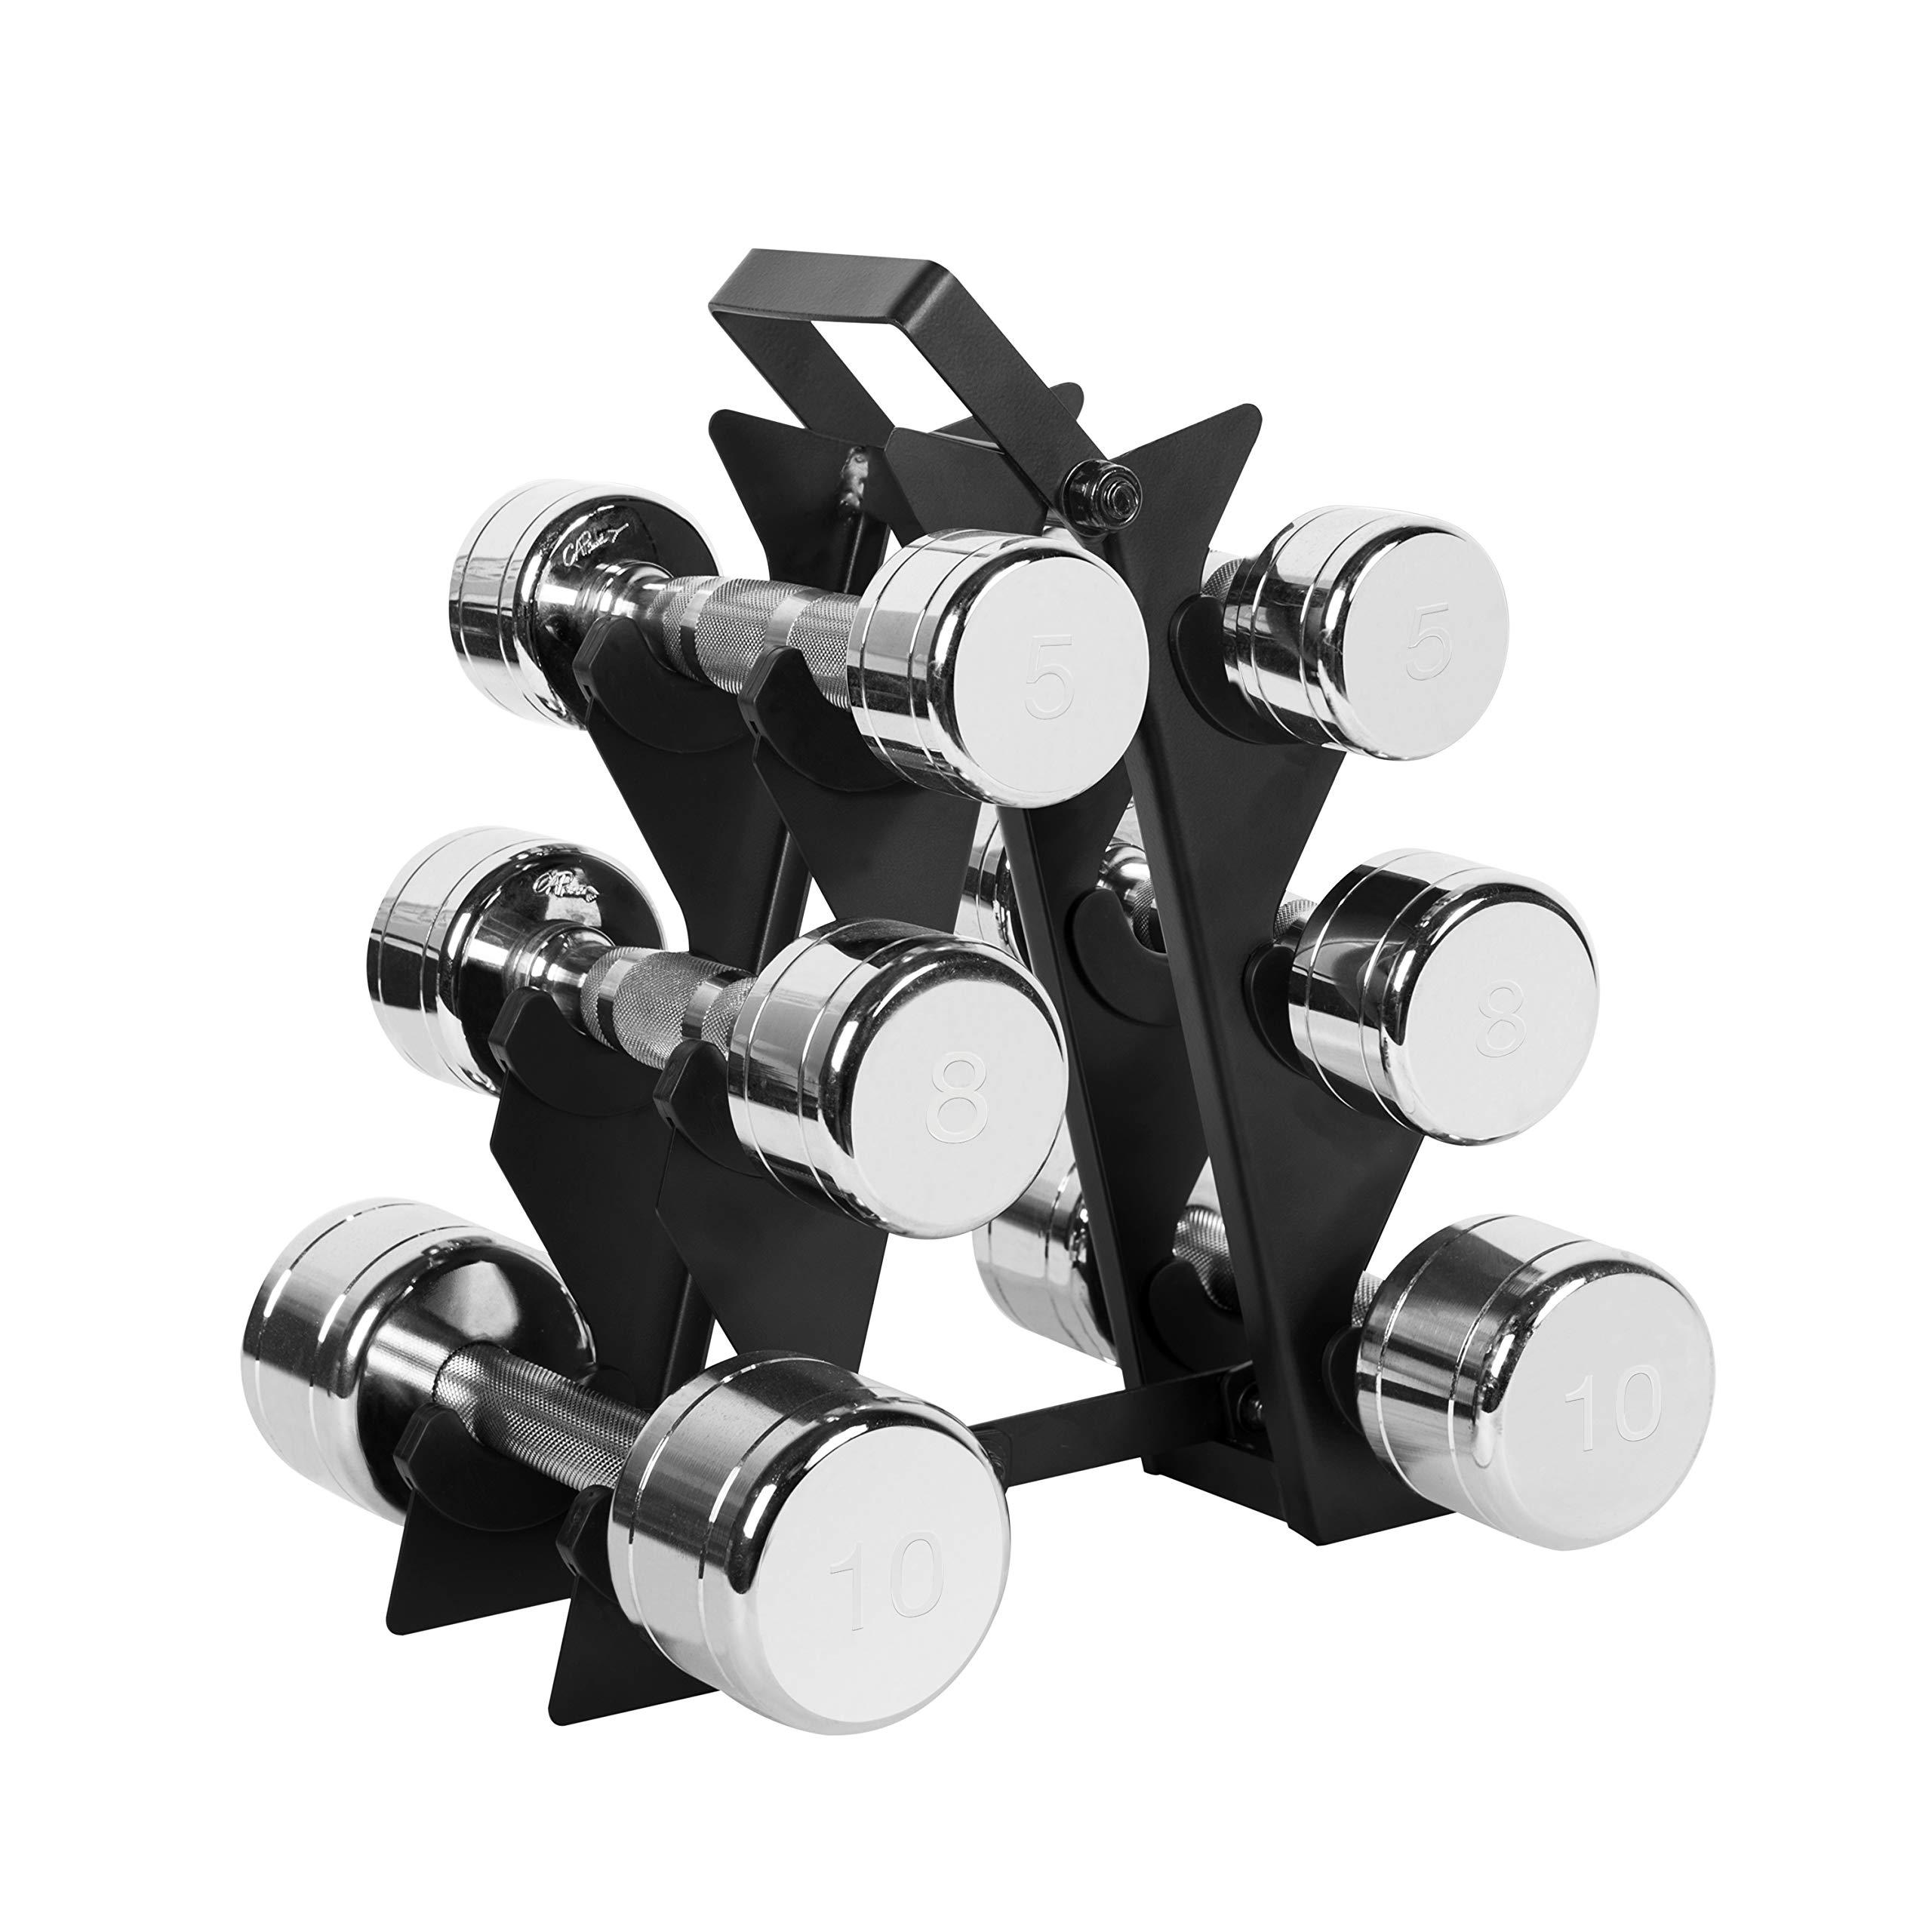 WF Athletic Supply Dumbbell Set with Storage Rack (46lb Chrome Dumbbell Set)